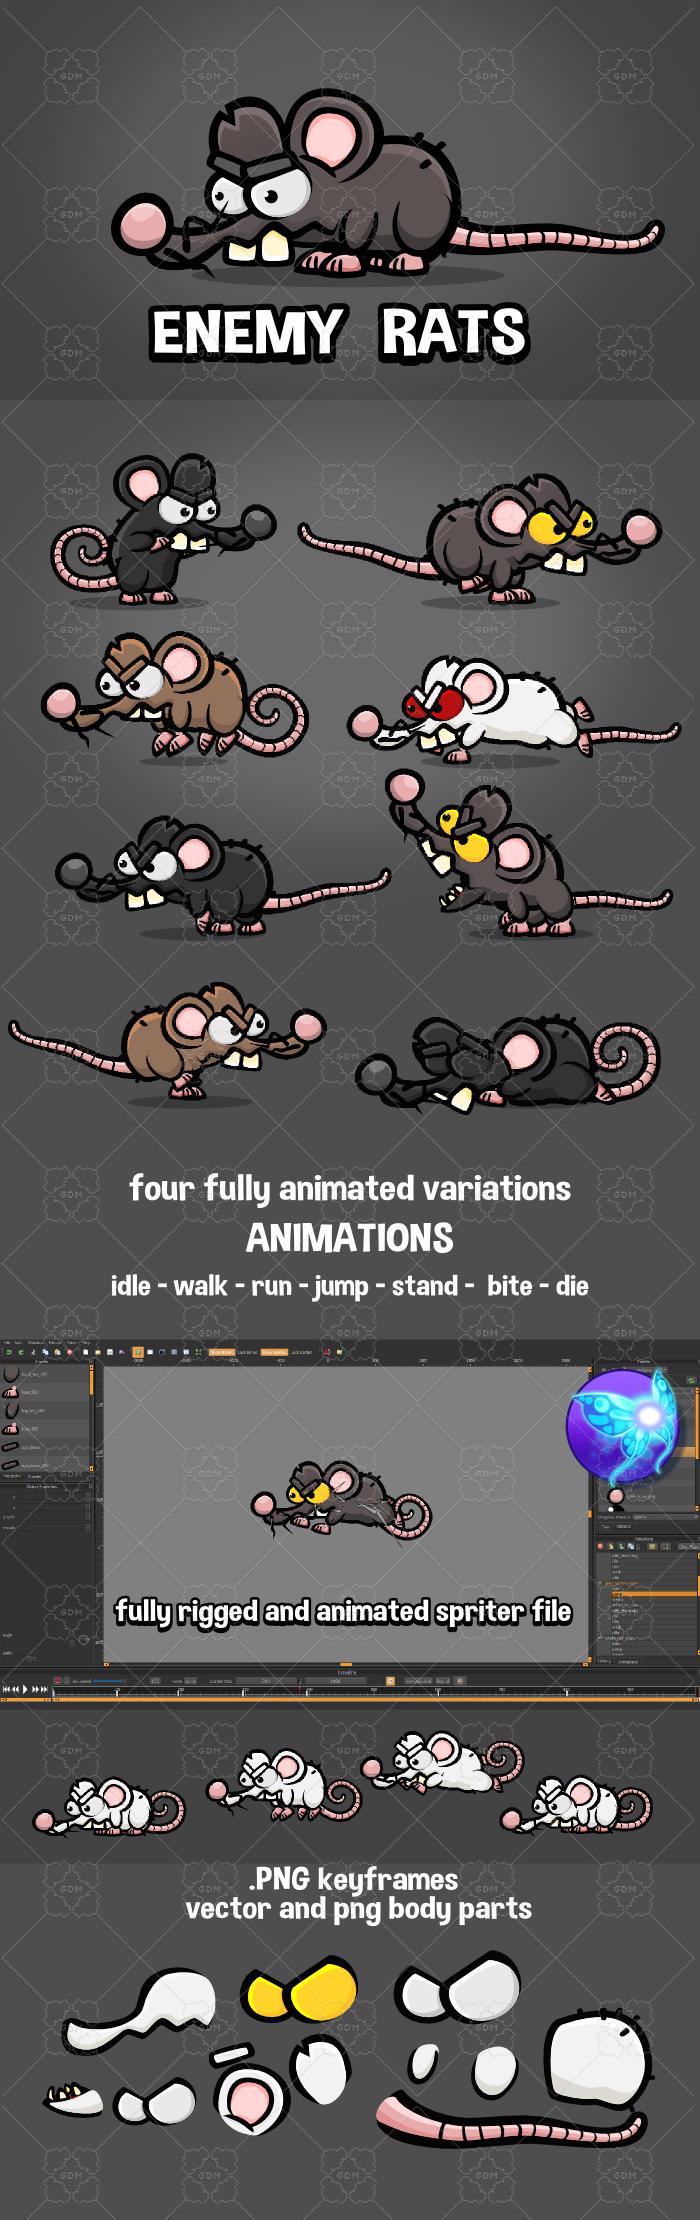 Enemy rats